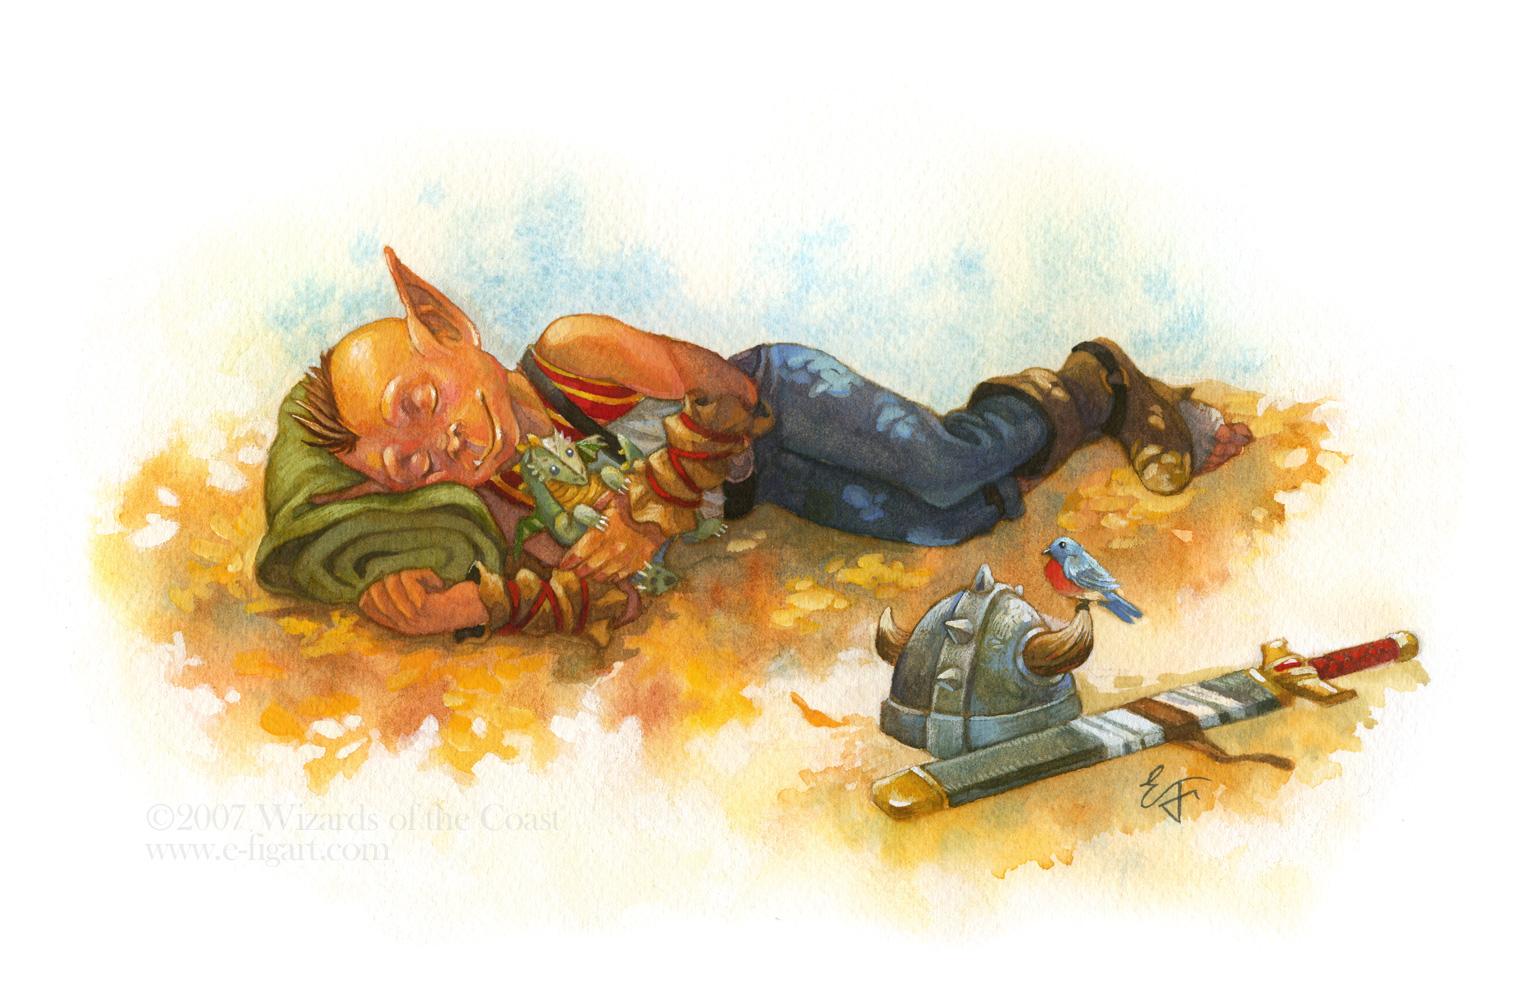 Goblin Kid Napping